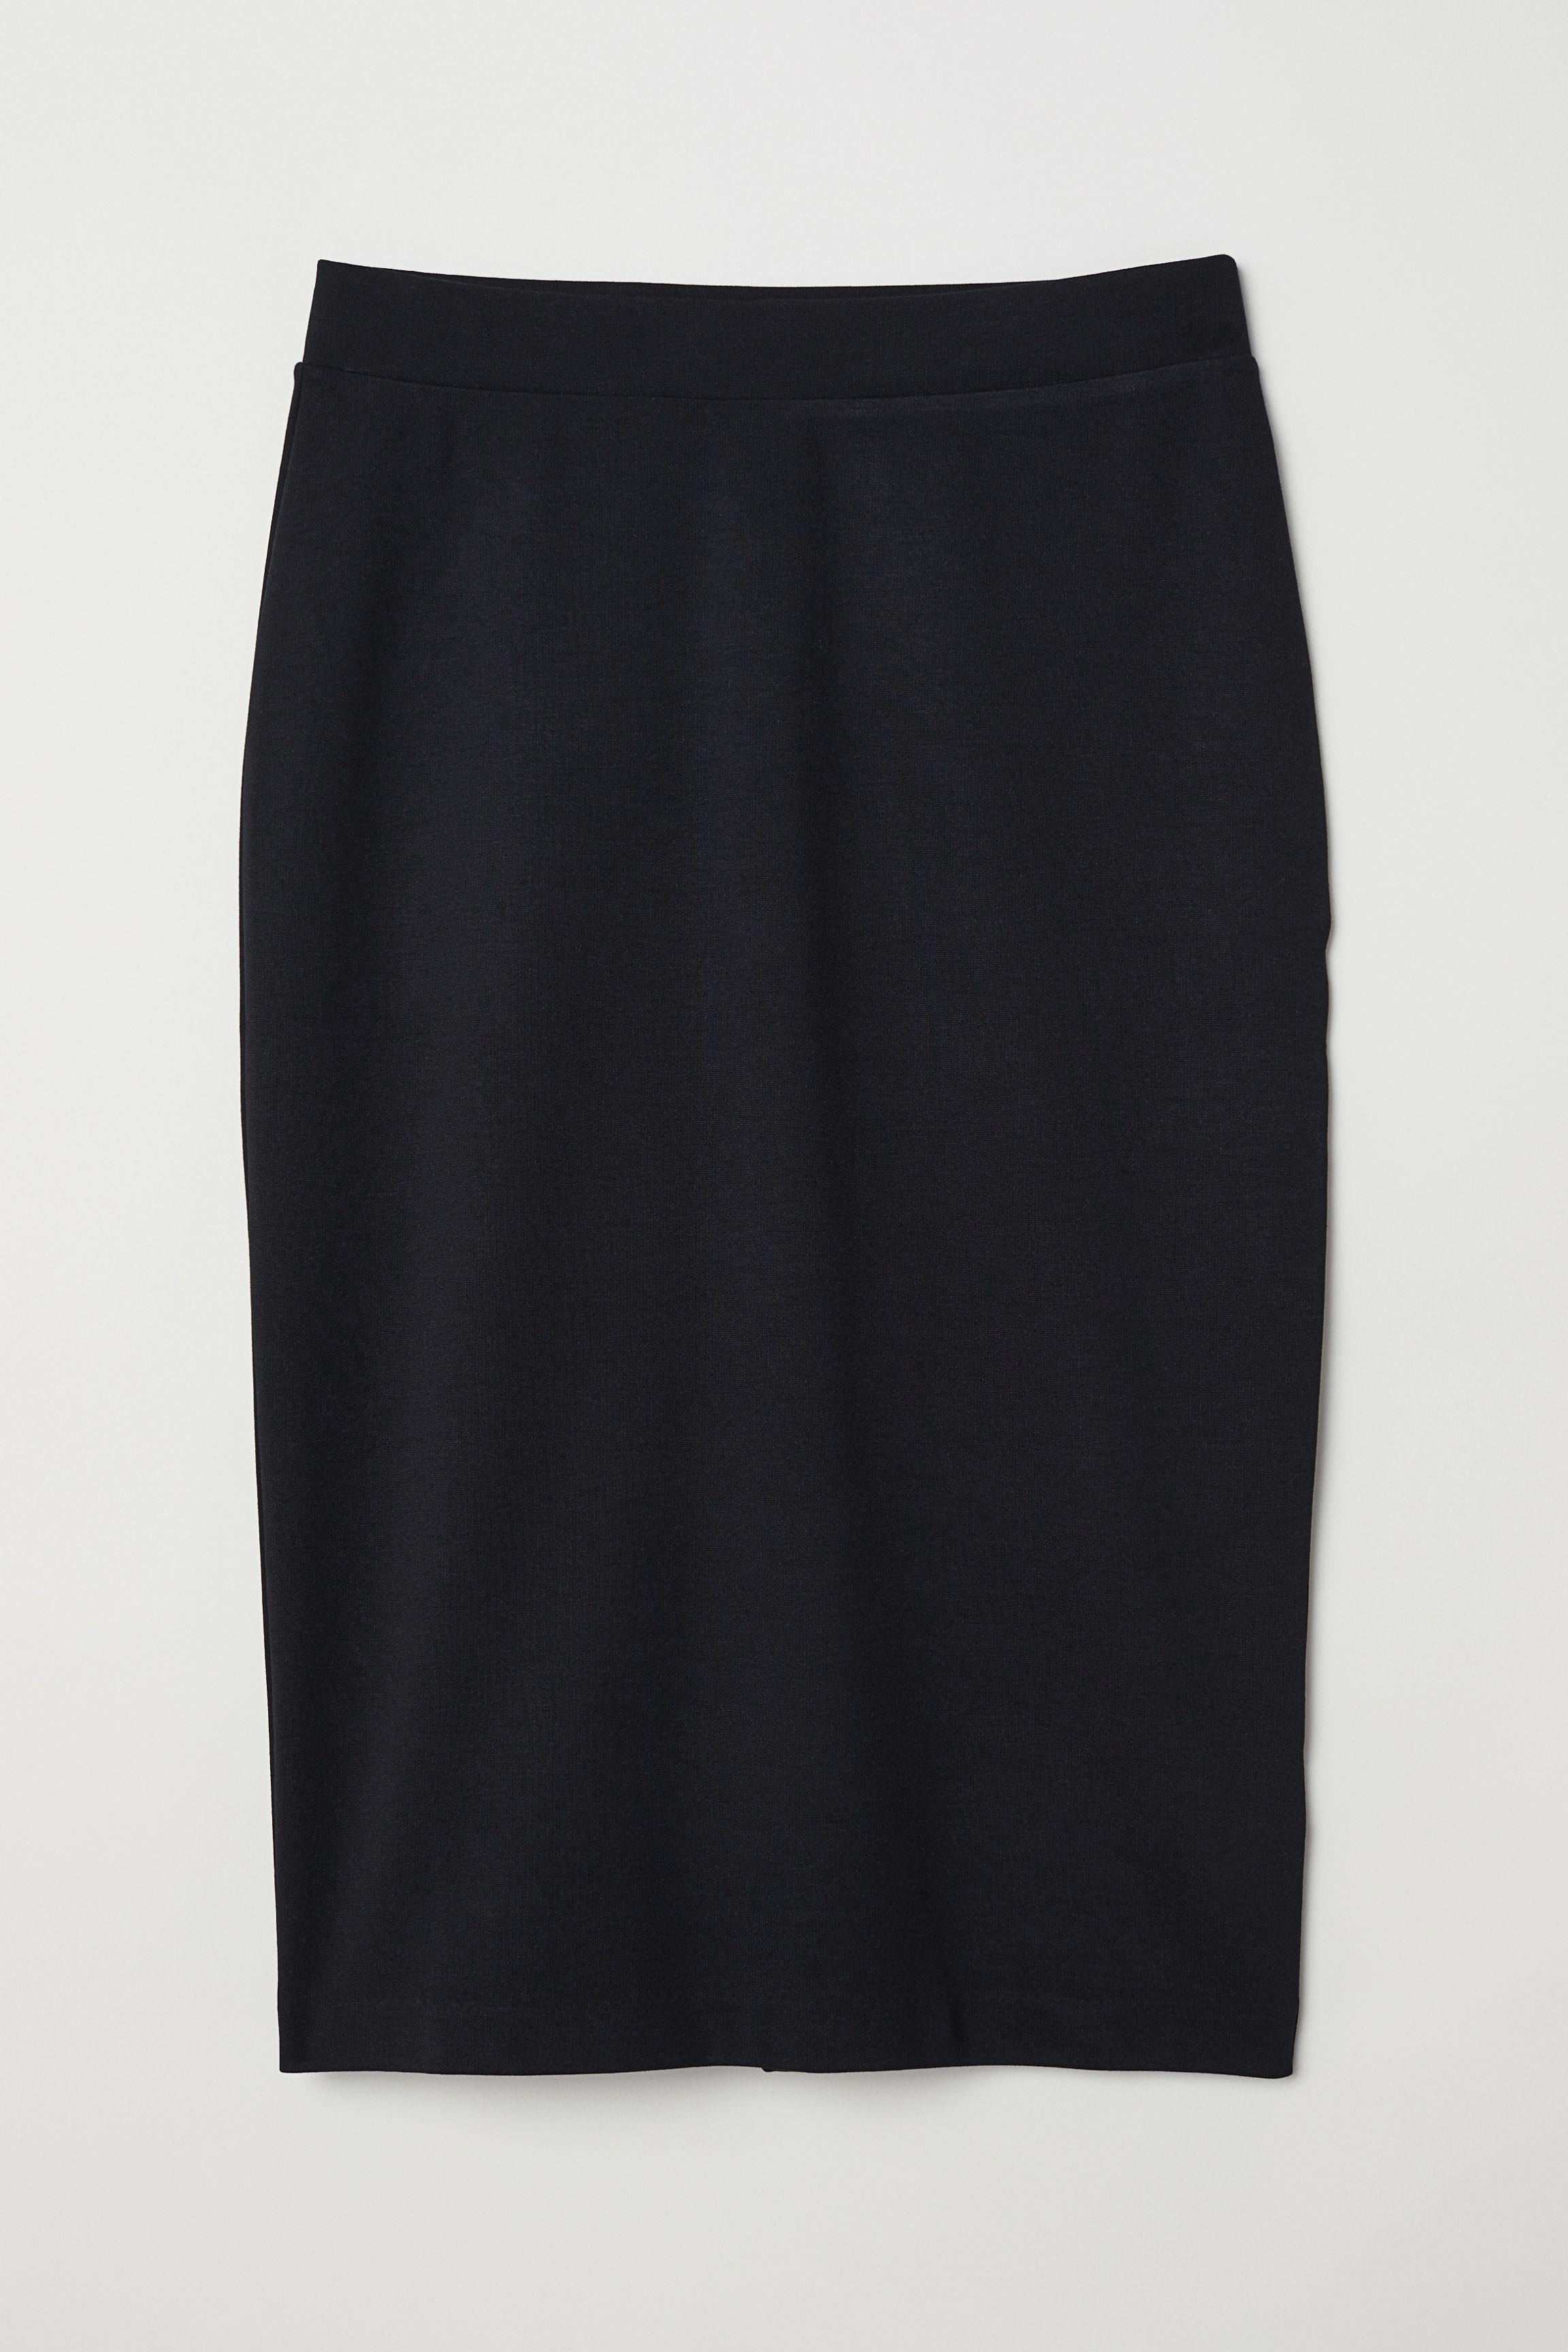 897cf7cf36 Jersey Pencil Skirt - Black - Ladies | H&M US